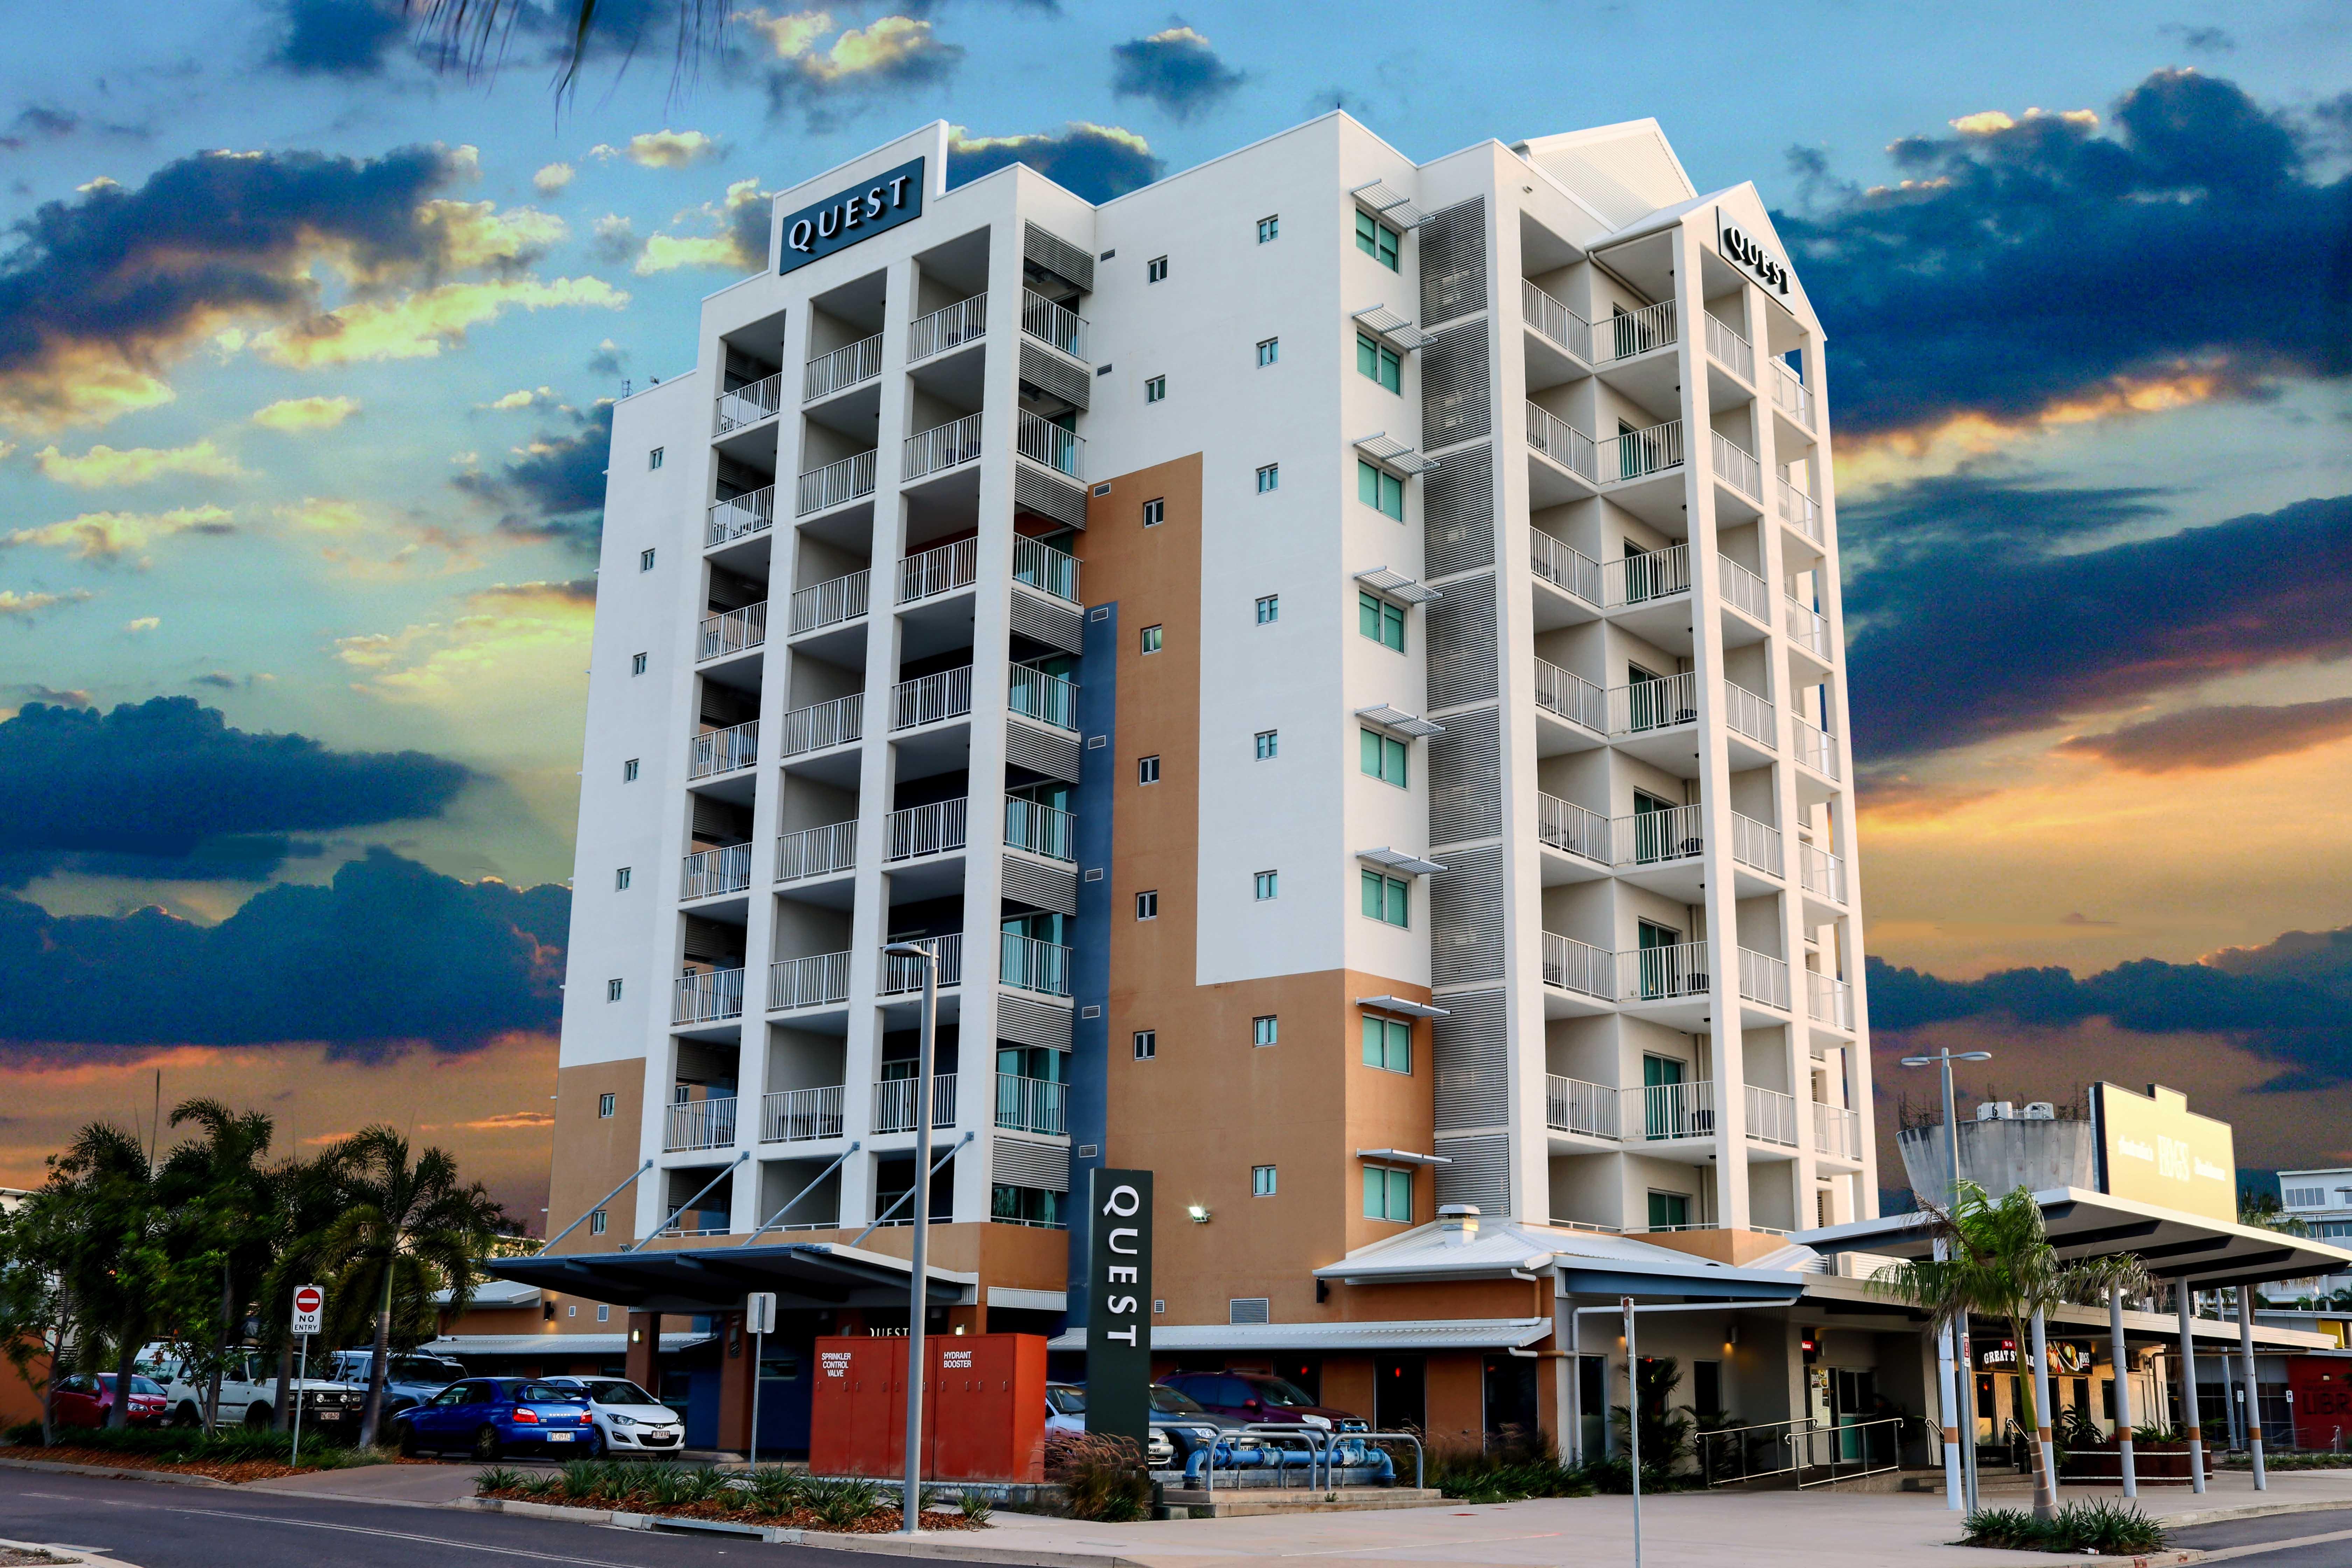 Quest Palmerston Serviced Apartments, Gunn-Palmerston